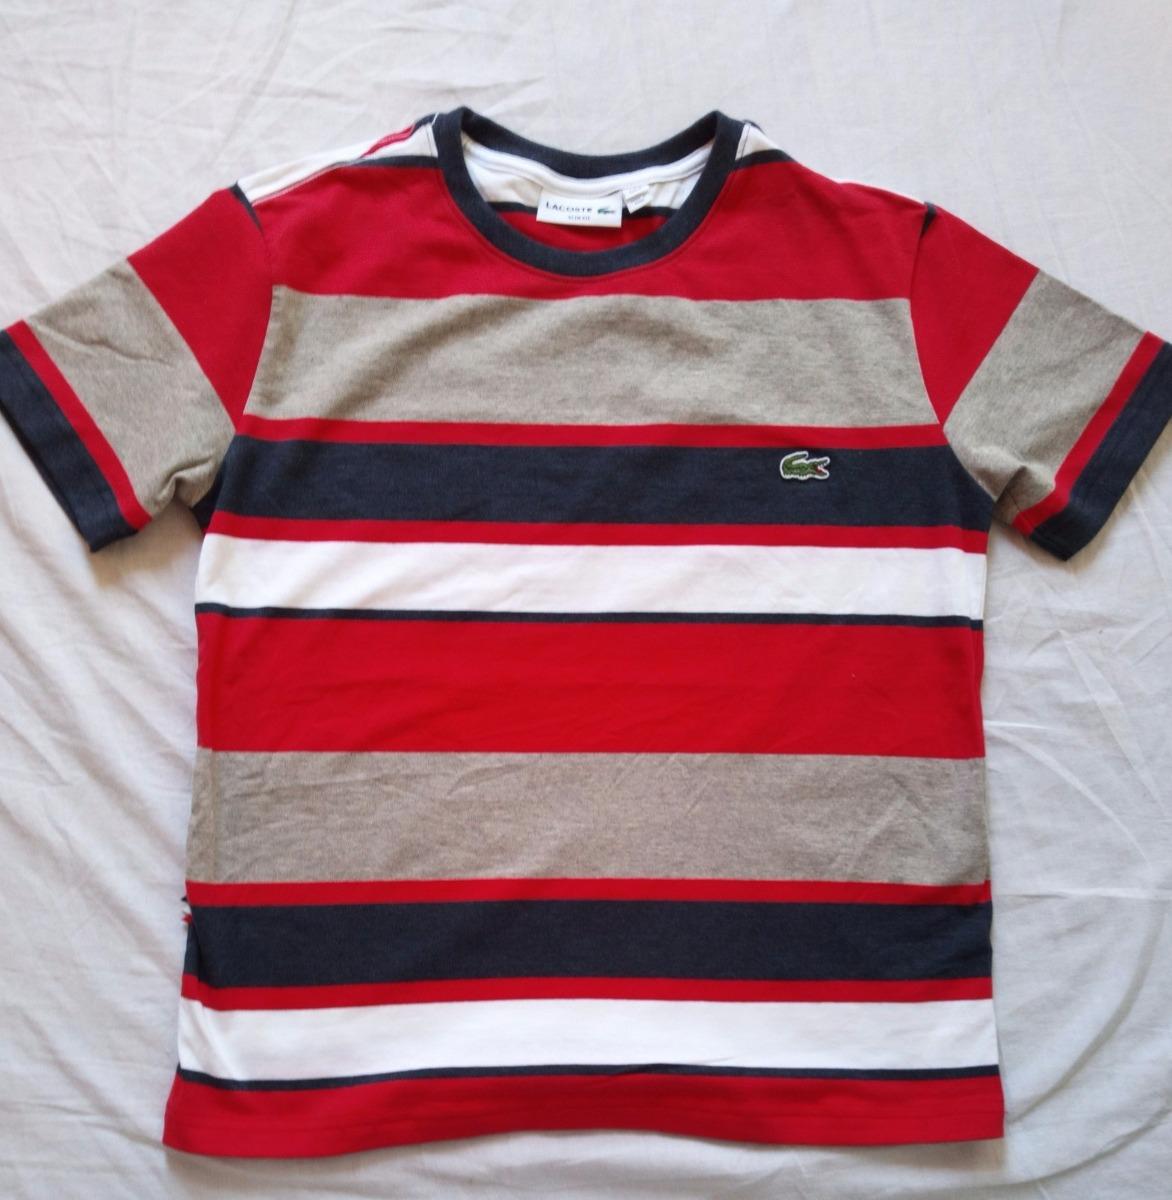 9f0cef84bbdae kit 5 camisetas lacoste listradas. Carregando zoom.